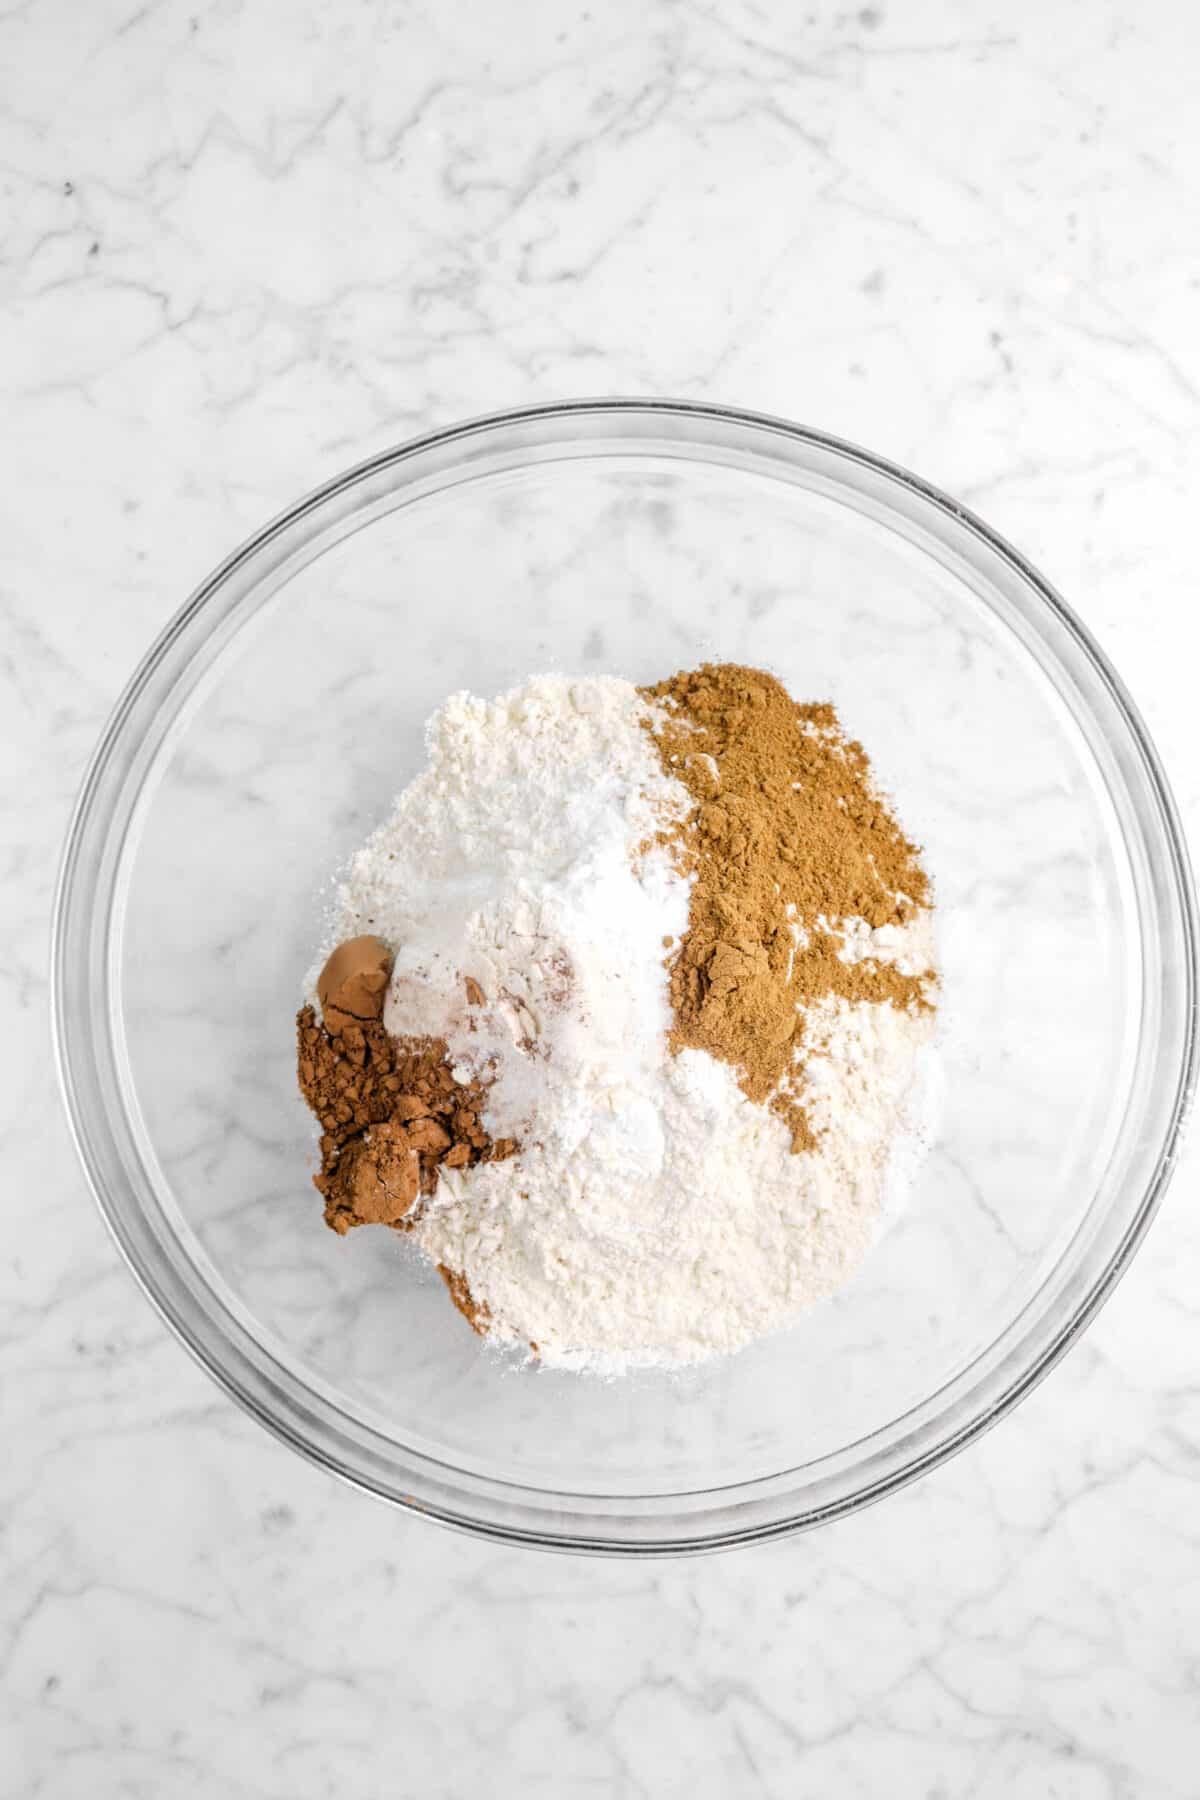 flour, baking powder, baking soda, cocoa powder, and pumpkin pie spice in a glass bowl